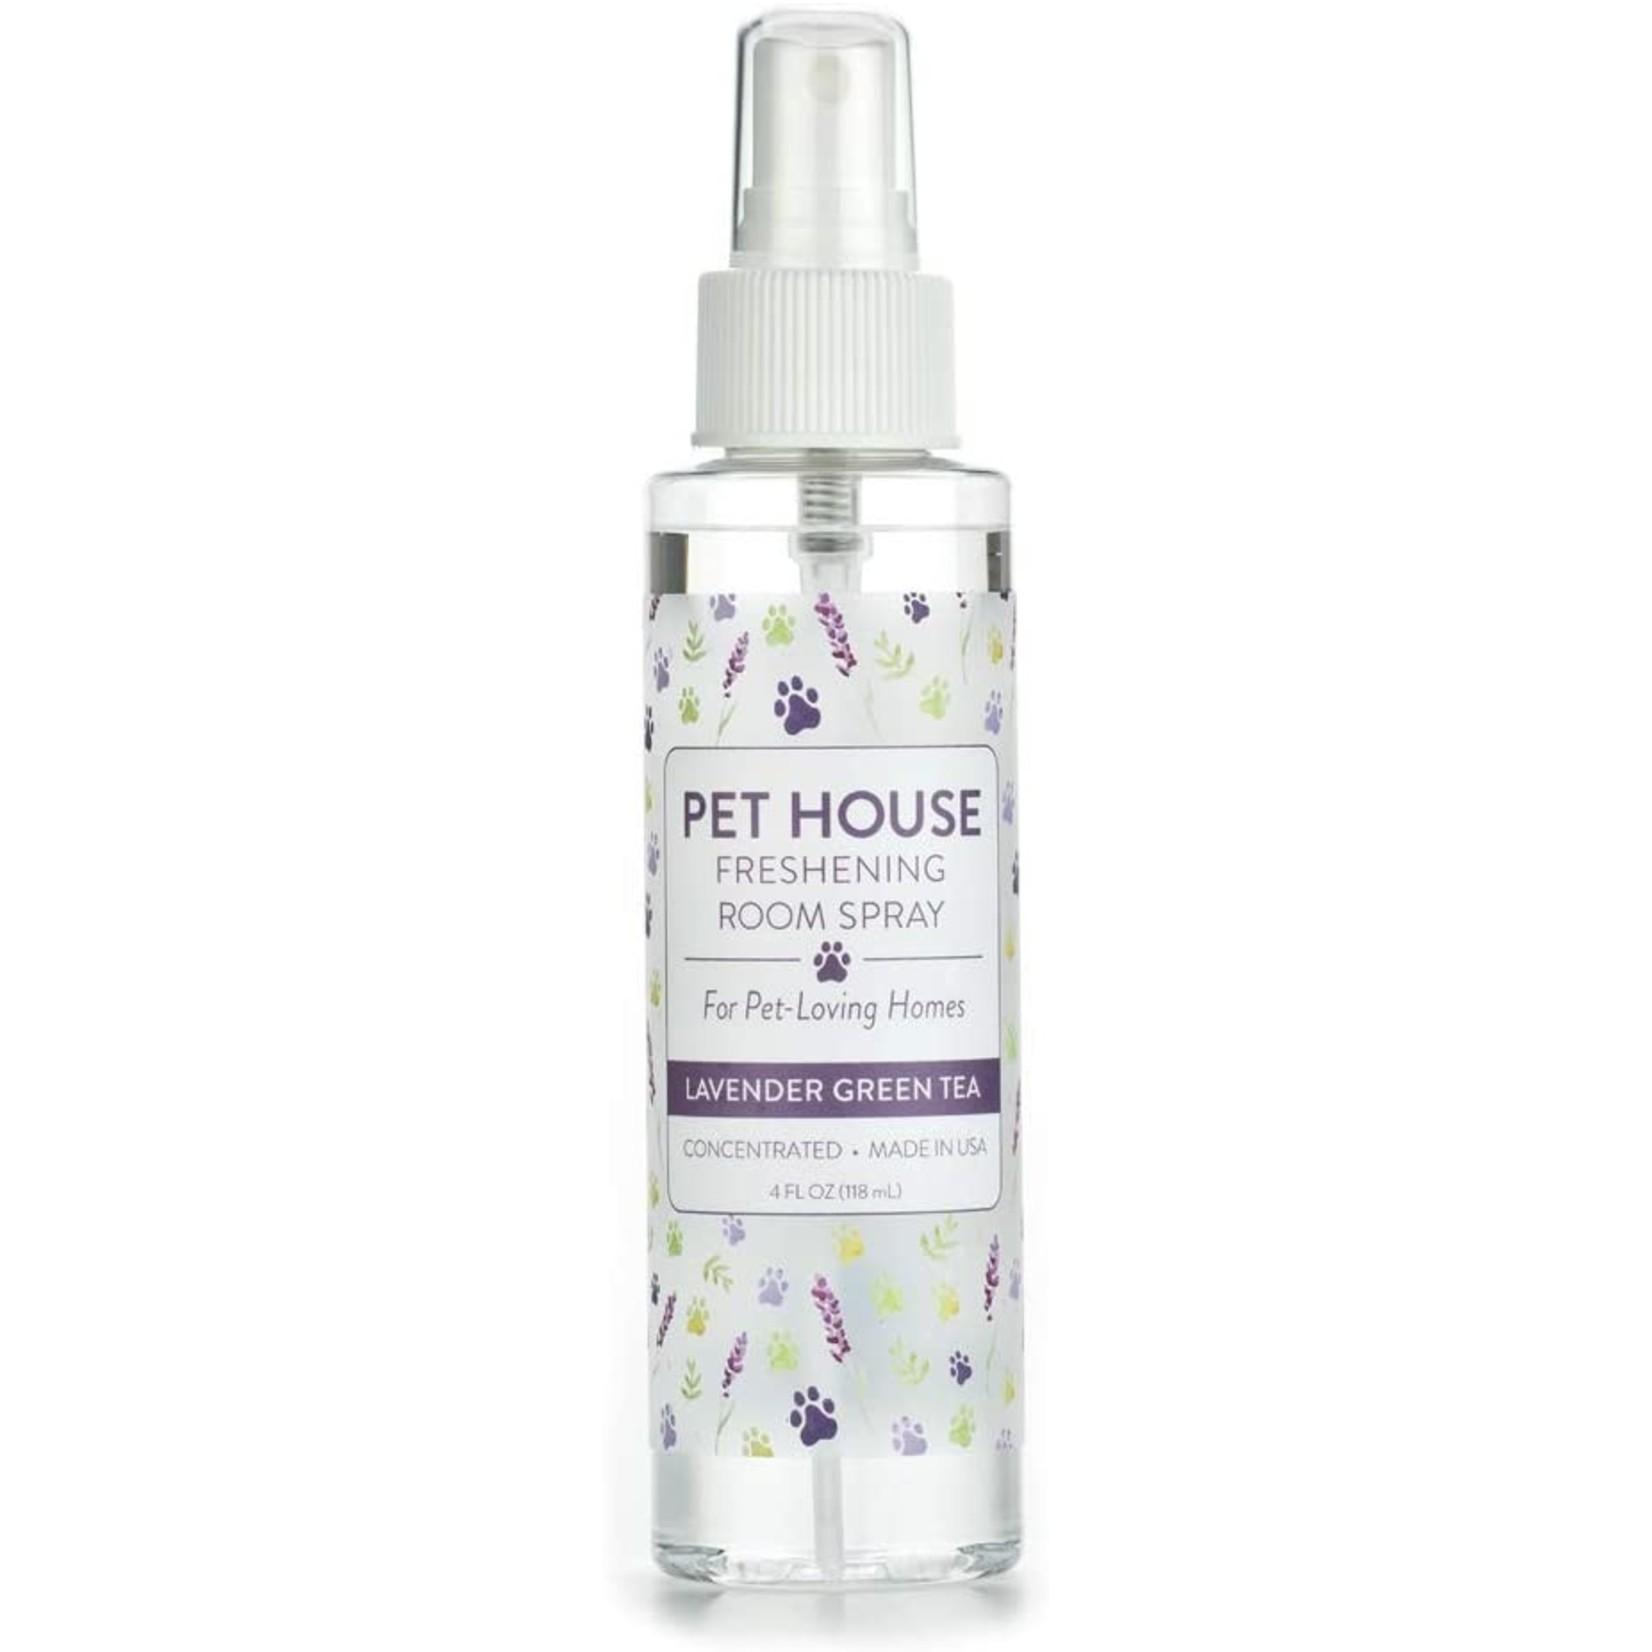 Pet House PET HOUSE Room Spray Lavender 4oz